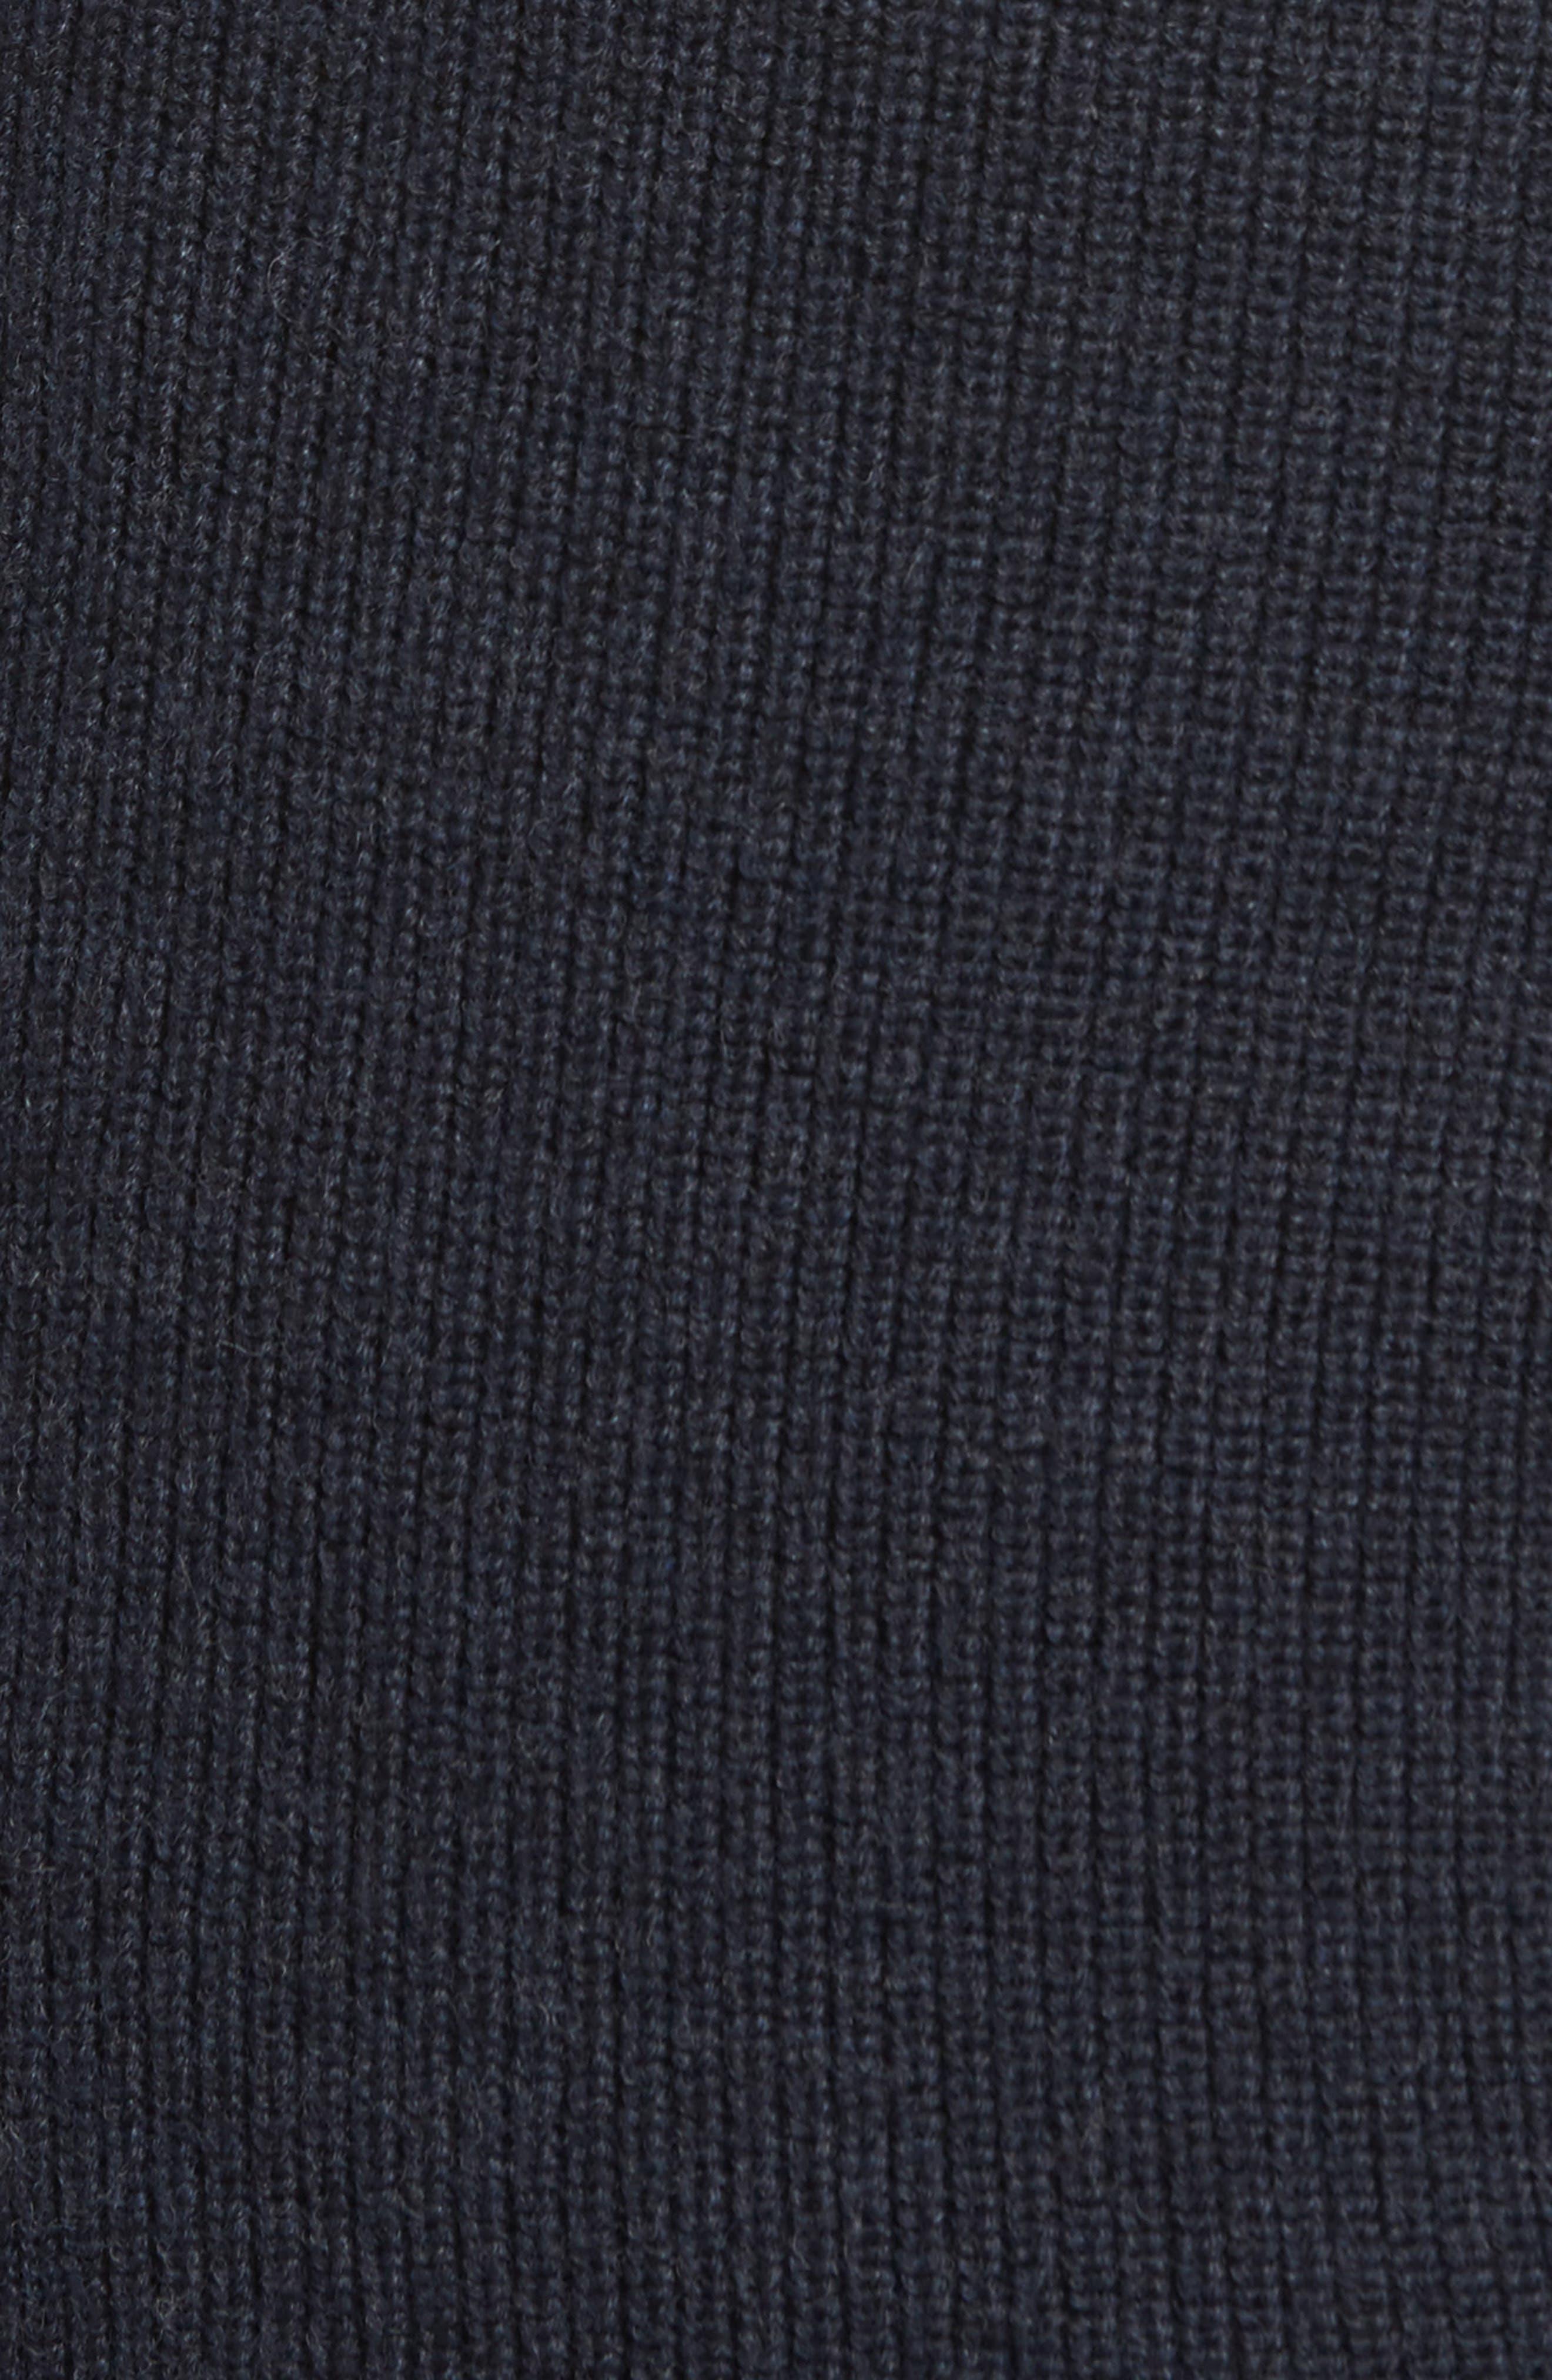 RODD & GUNN, Camerons Track Zip Wool Sweater, Alternate thumbnail 5, color, 412